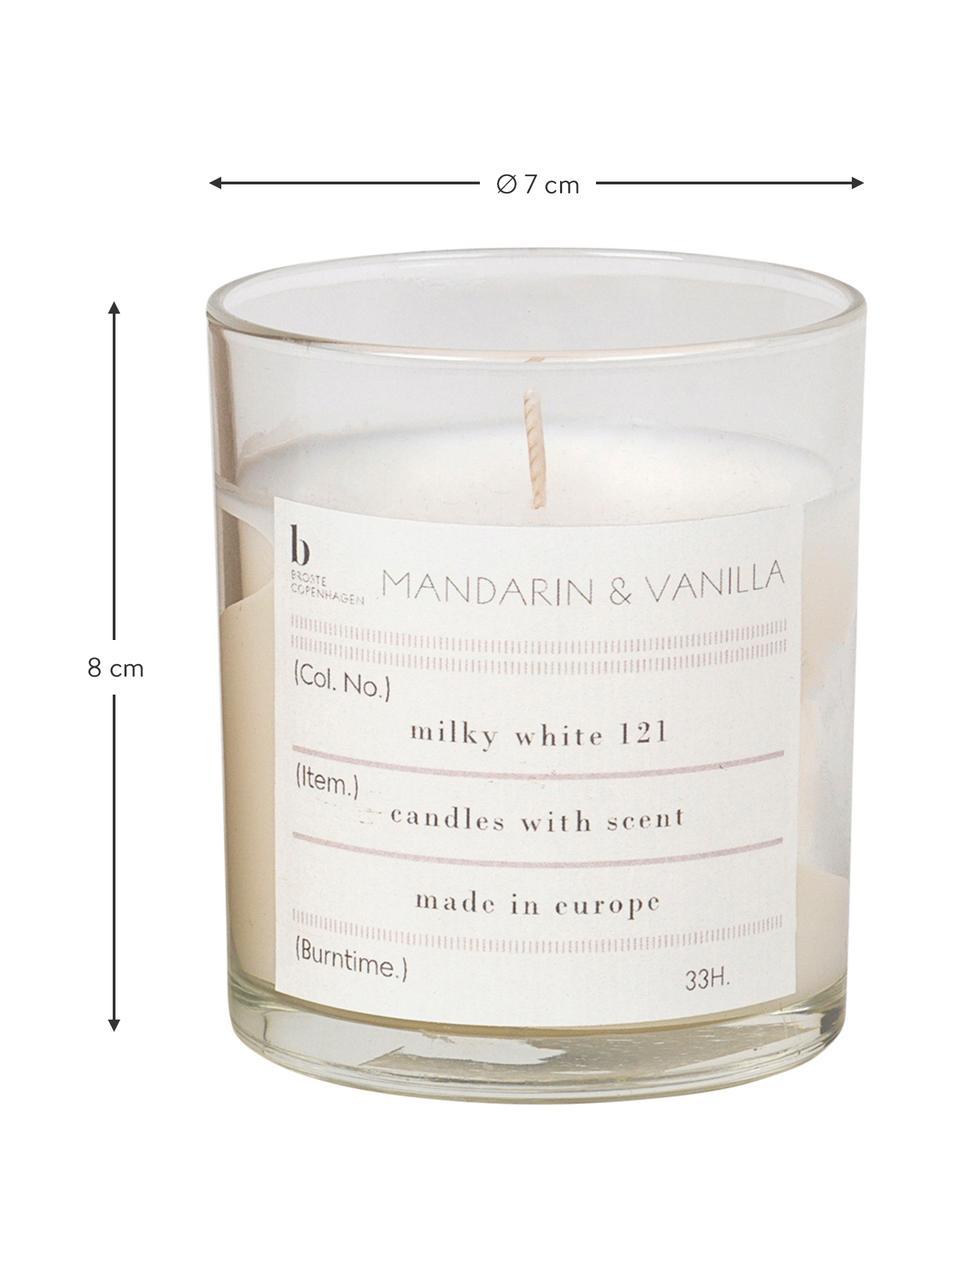 Duftkerze Mandarin (Mandarine & Vanille), Behälter: Glas, Mandarine & Vanille, Ø 8 x H 8 cm